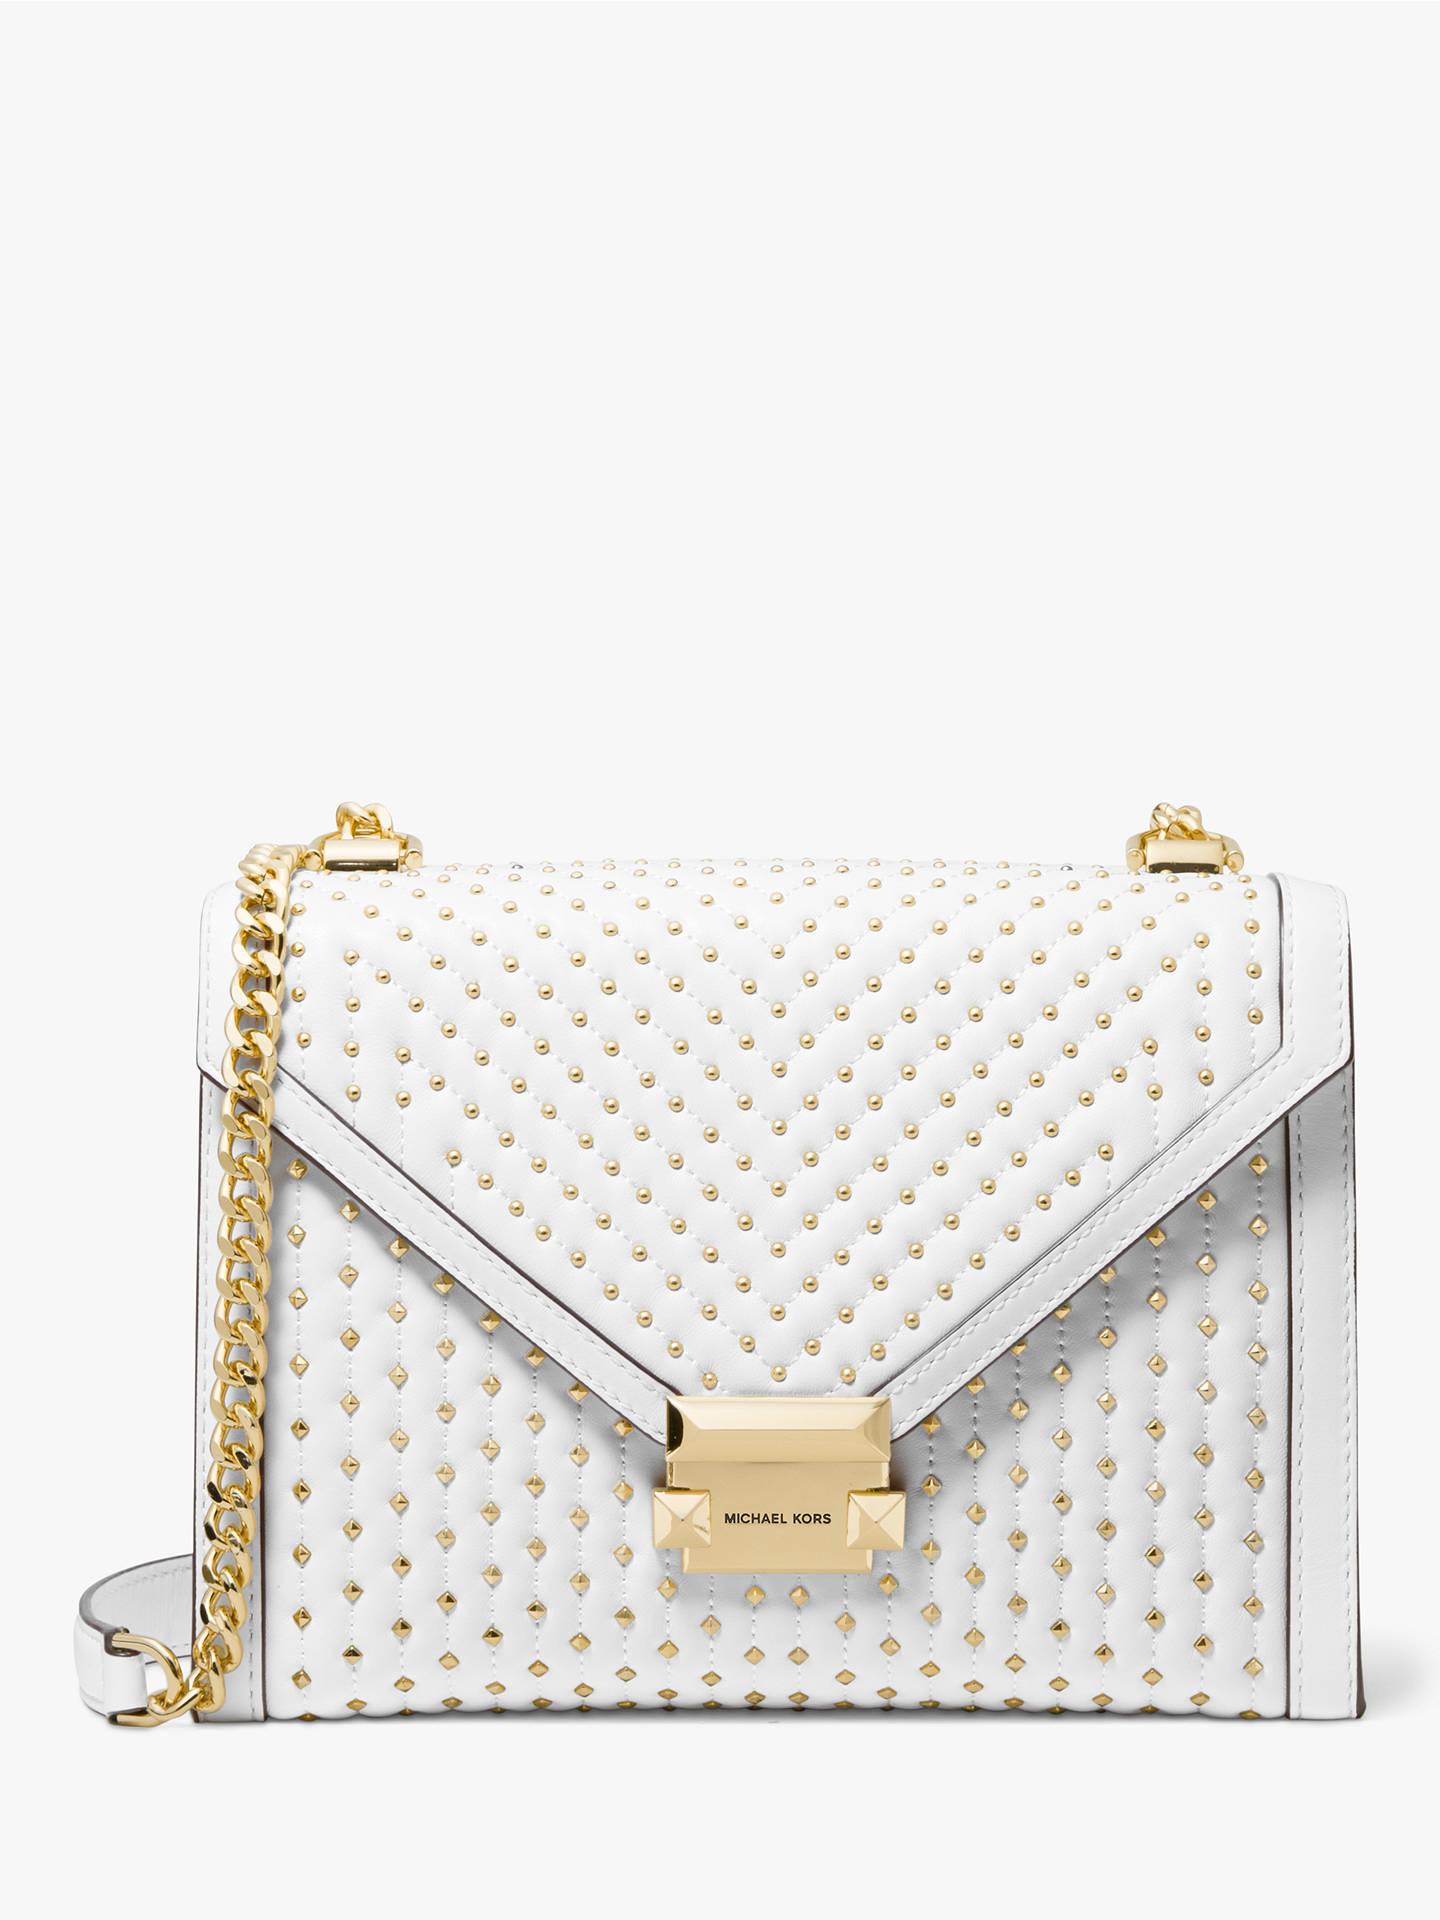 c3f3cd5b67a1 Buy MICHAEL Michael Kors Whitney Leather Stud Large Shoulder Bag